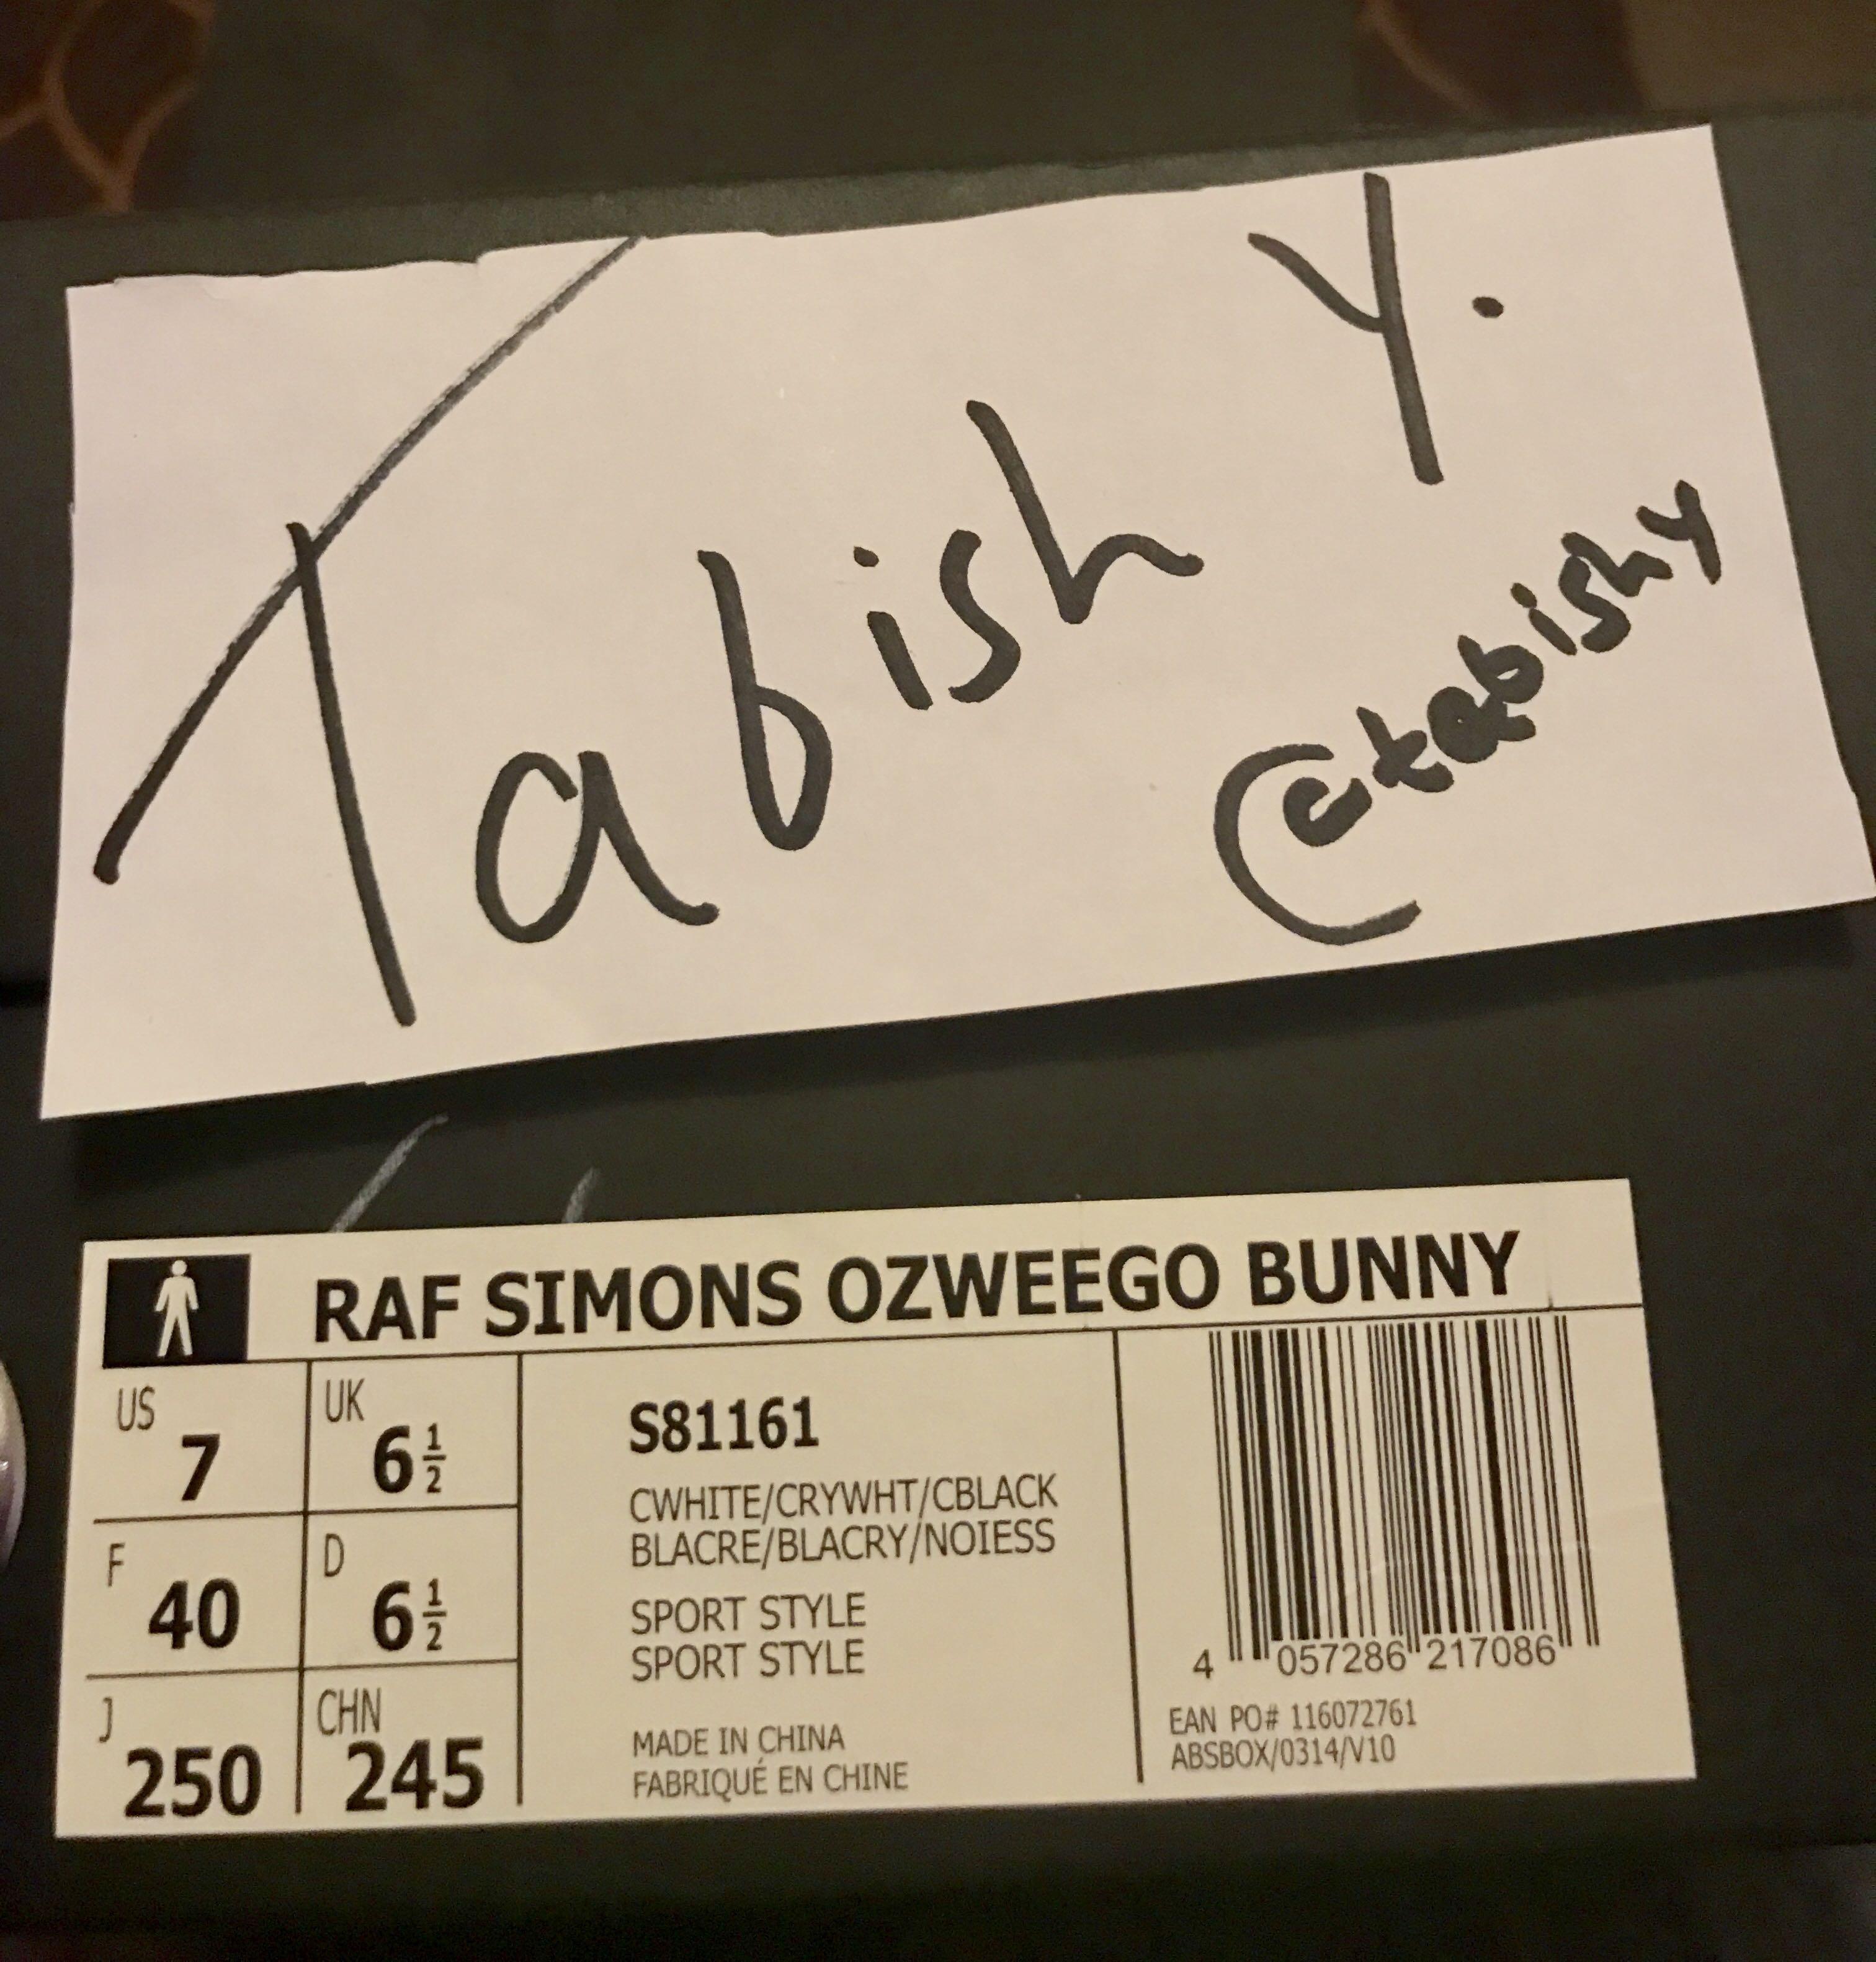 87c208672d7e Adidas x Raf Simons Ozweego Bunny Cream UK 6.5 US 7